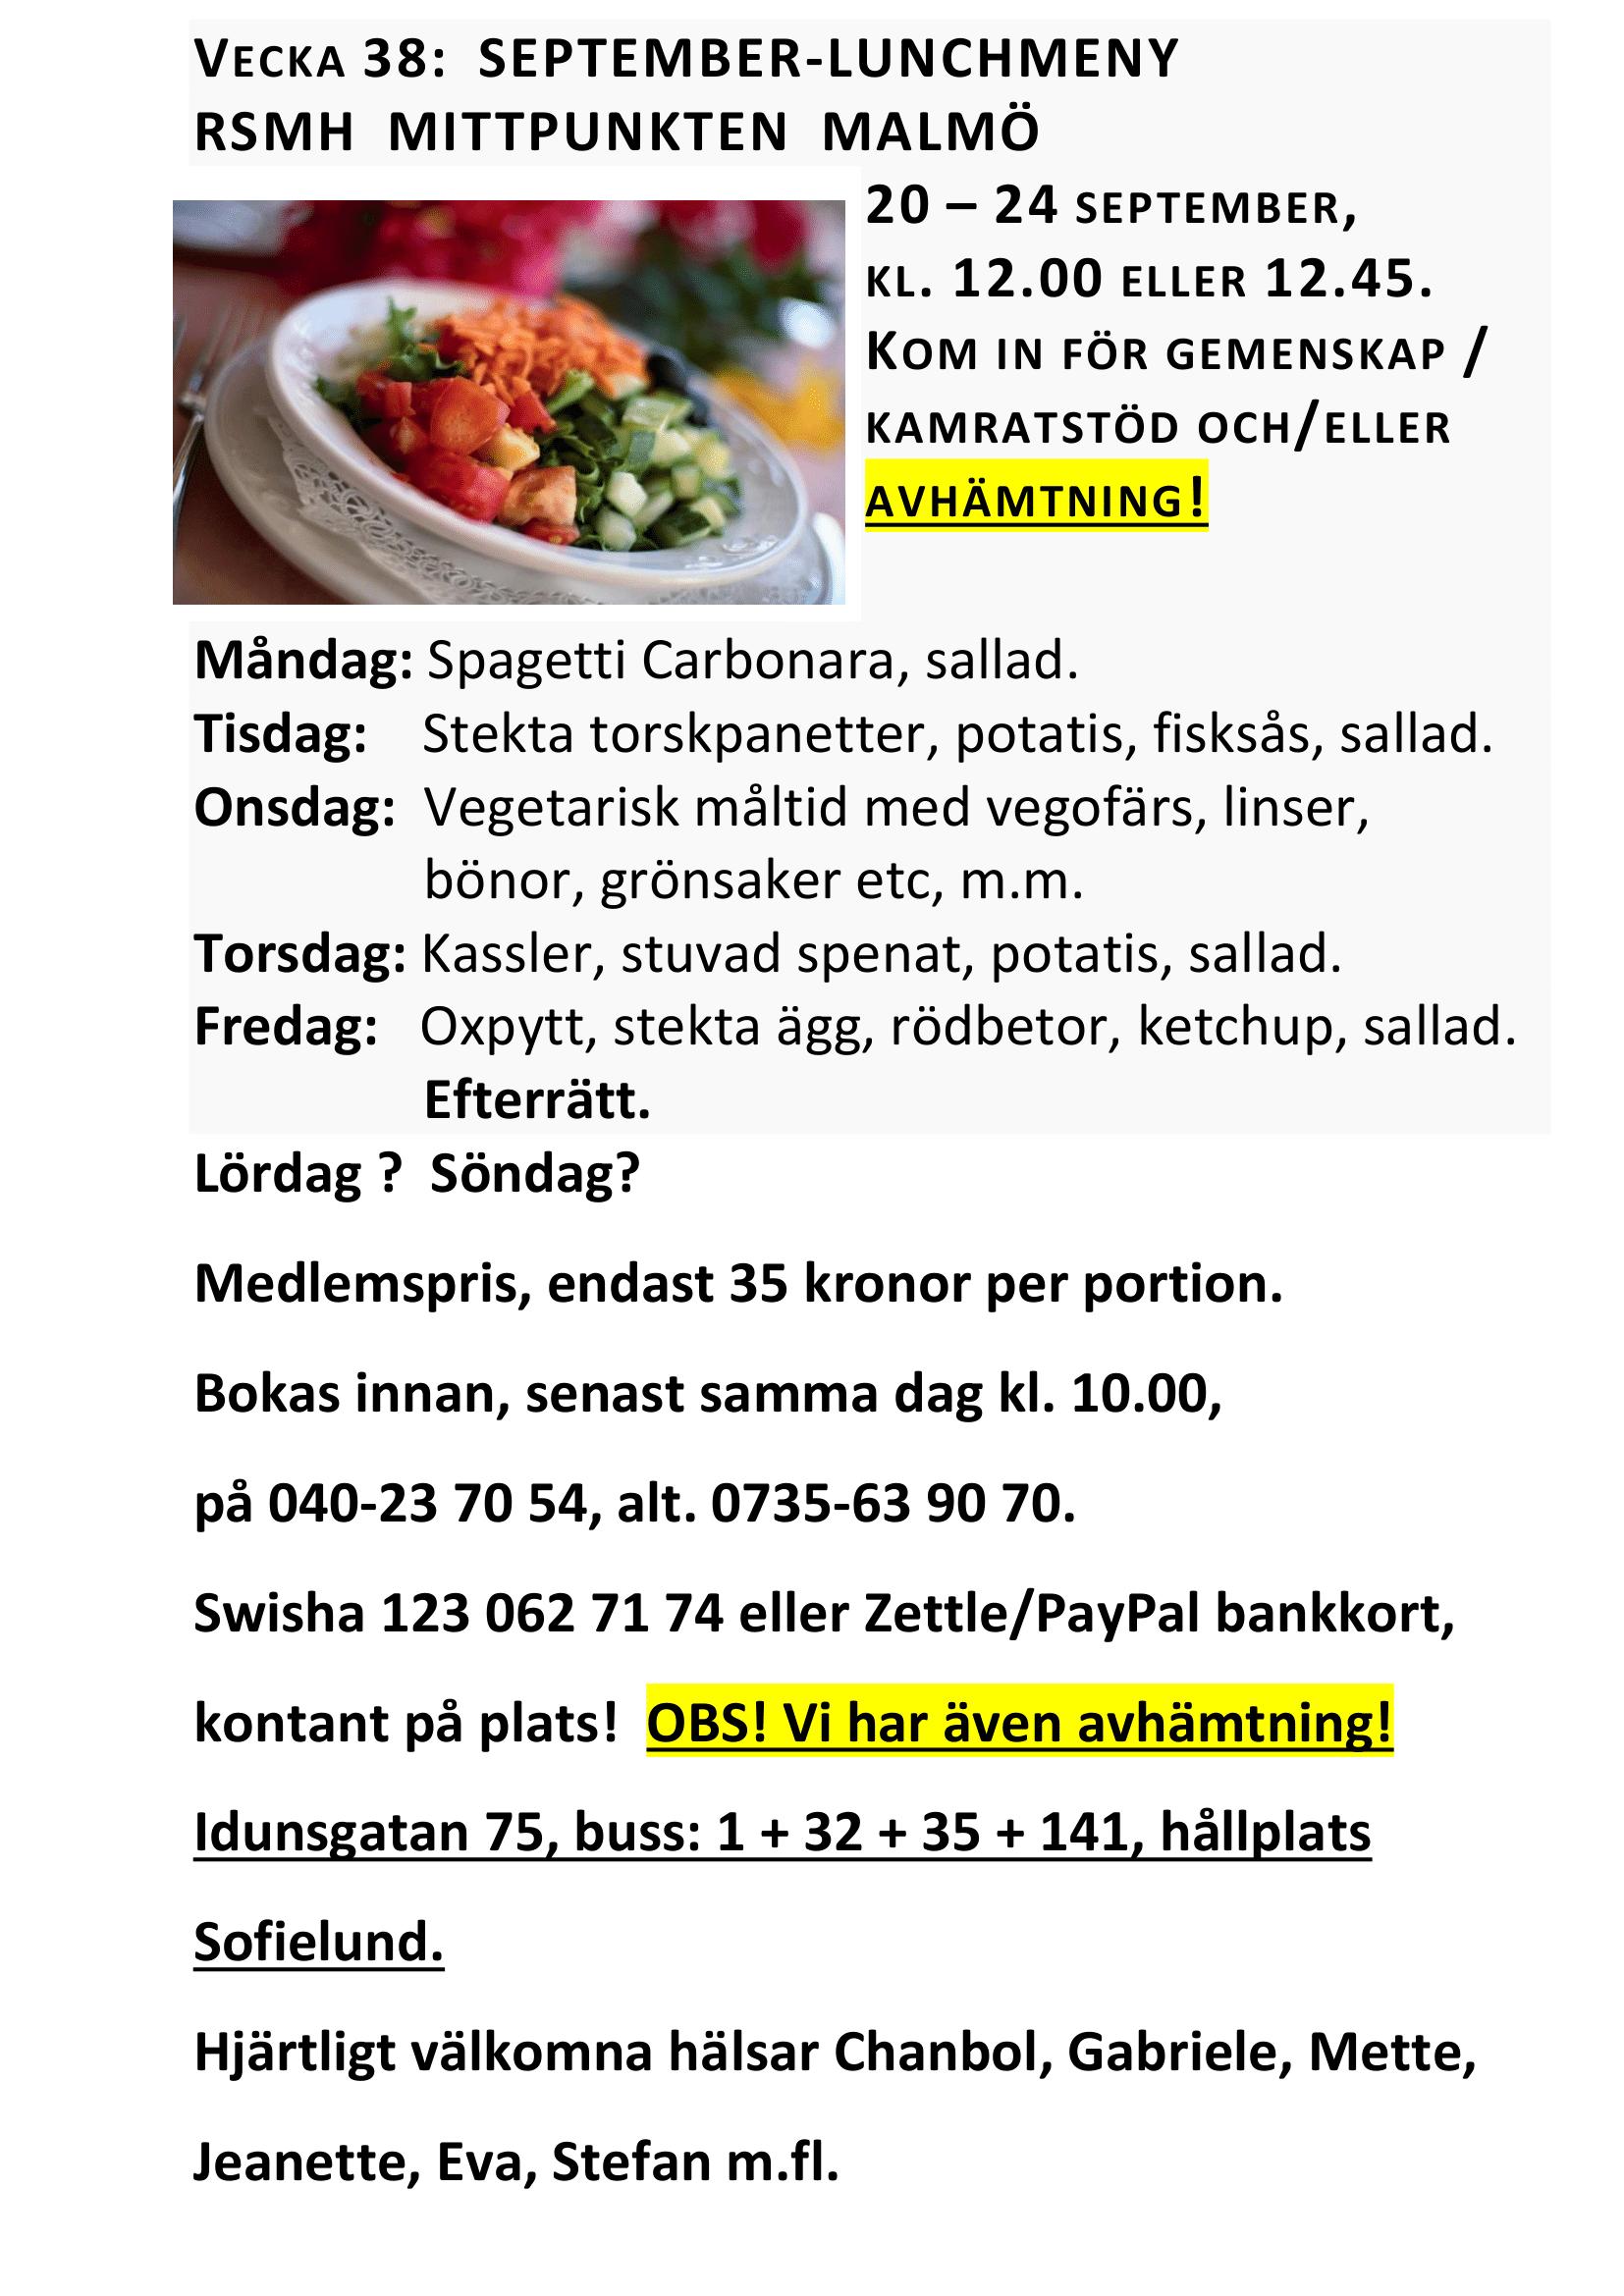 Lunchmeny vecka 38 20 – 24 september, kl. 12.00 2021 RSMH Mittpunkten Malmö - Idunsgatan 75 i Malmö-1.png